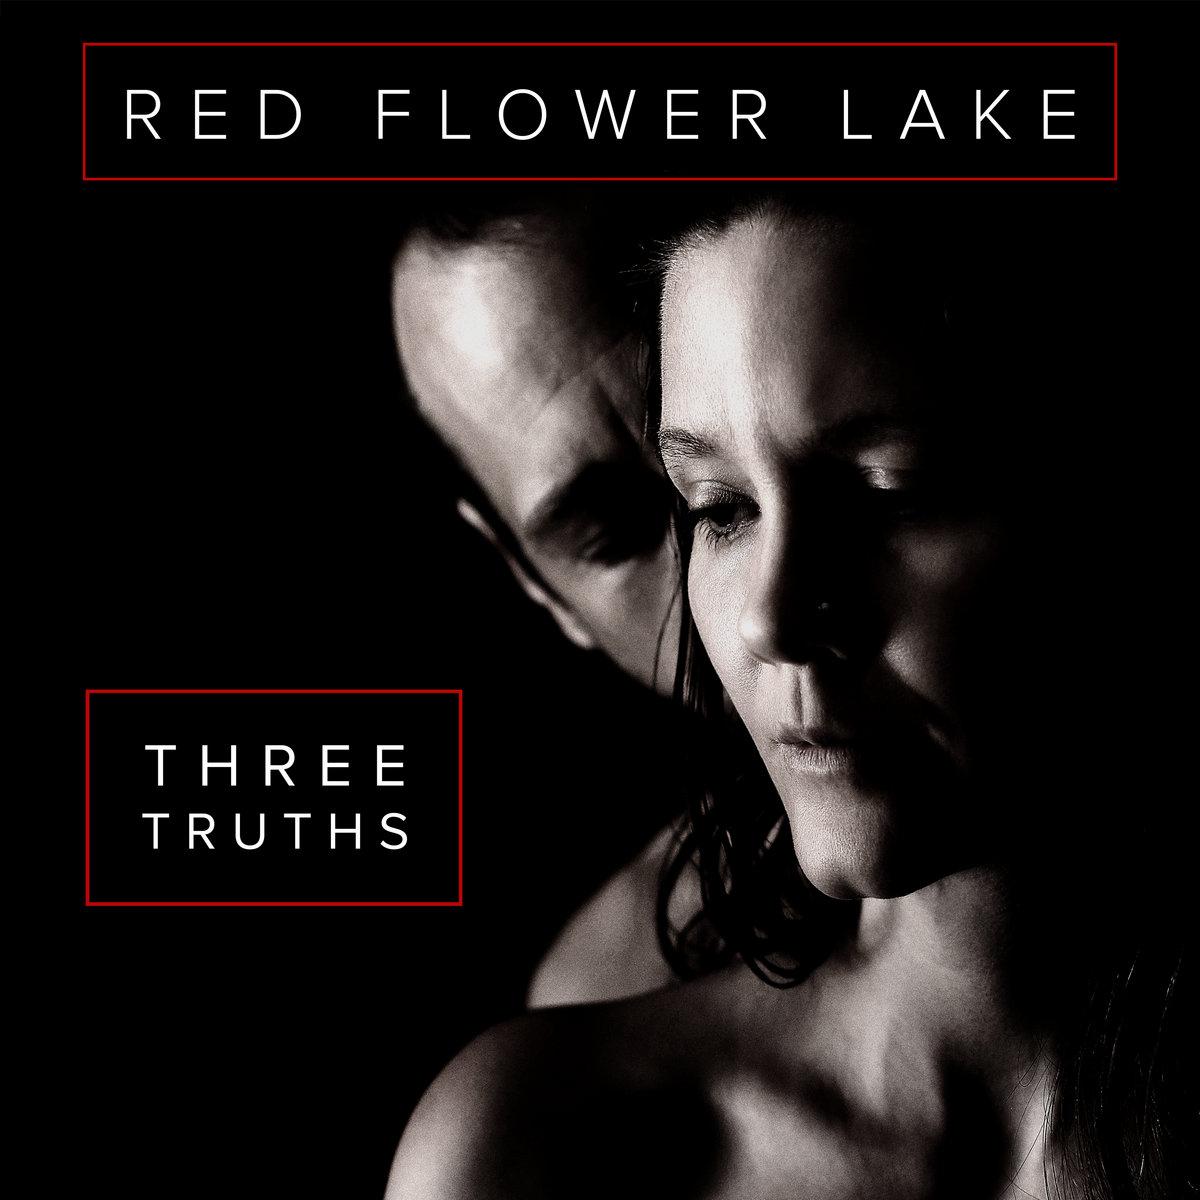 Three Truths | Red Flower Lake